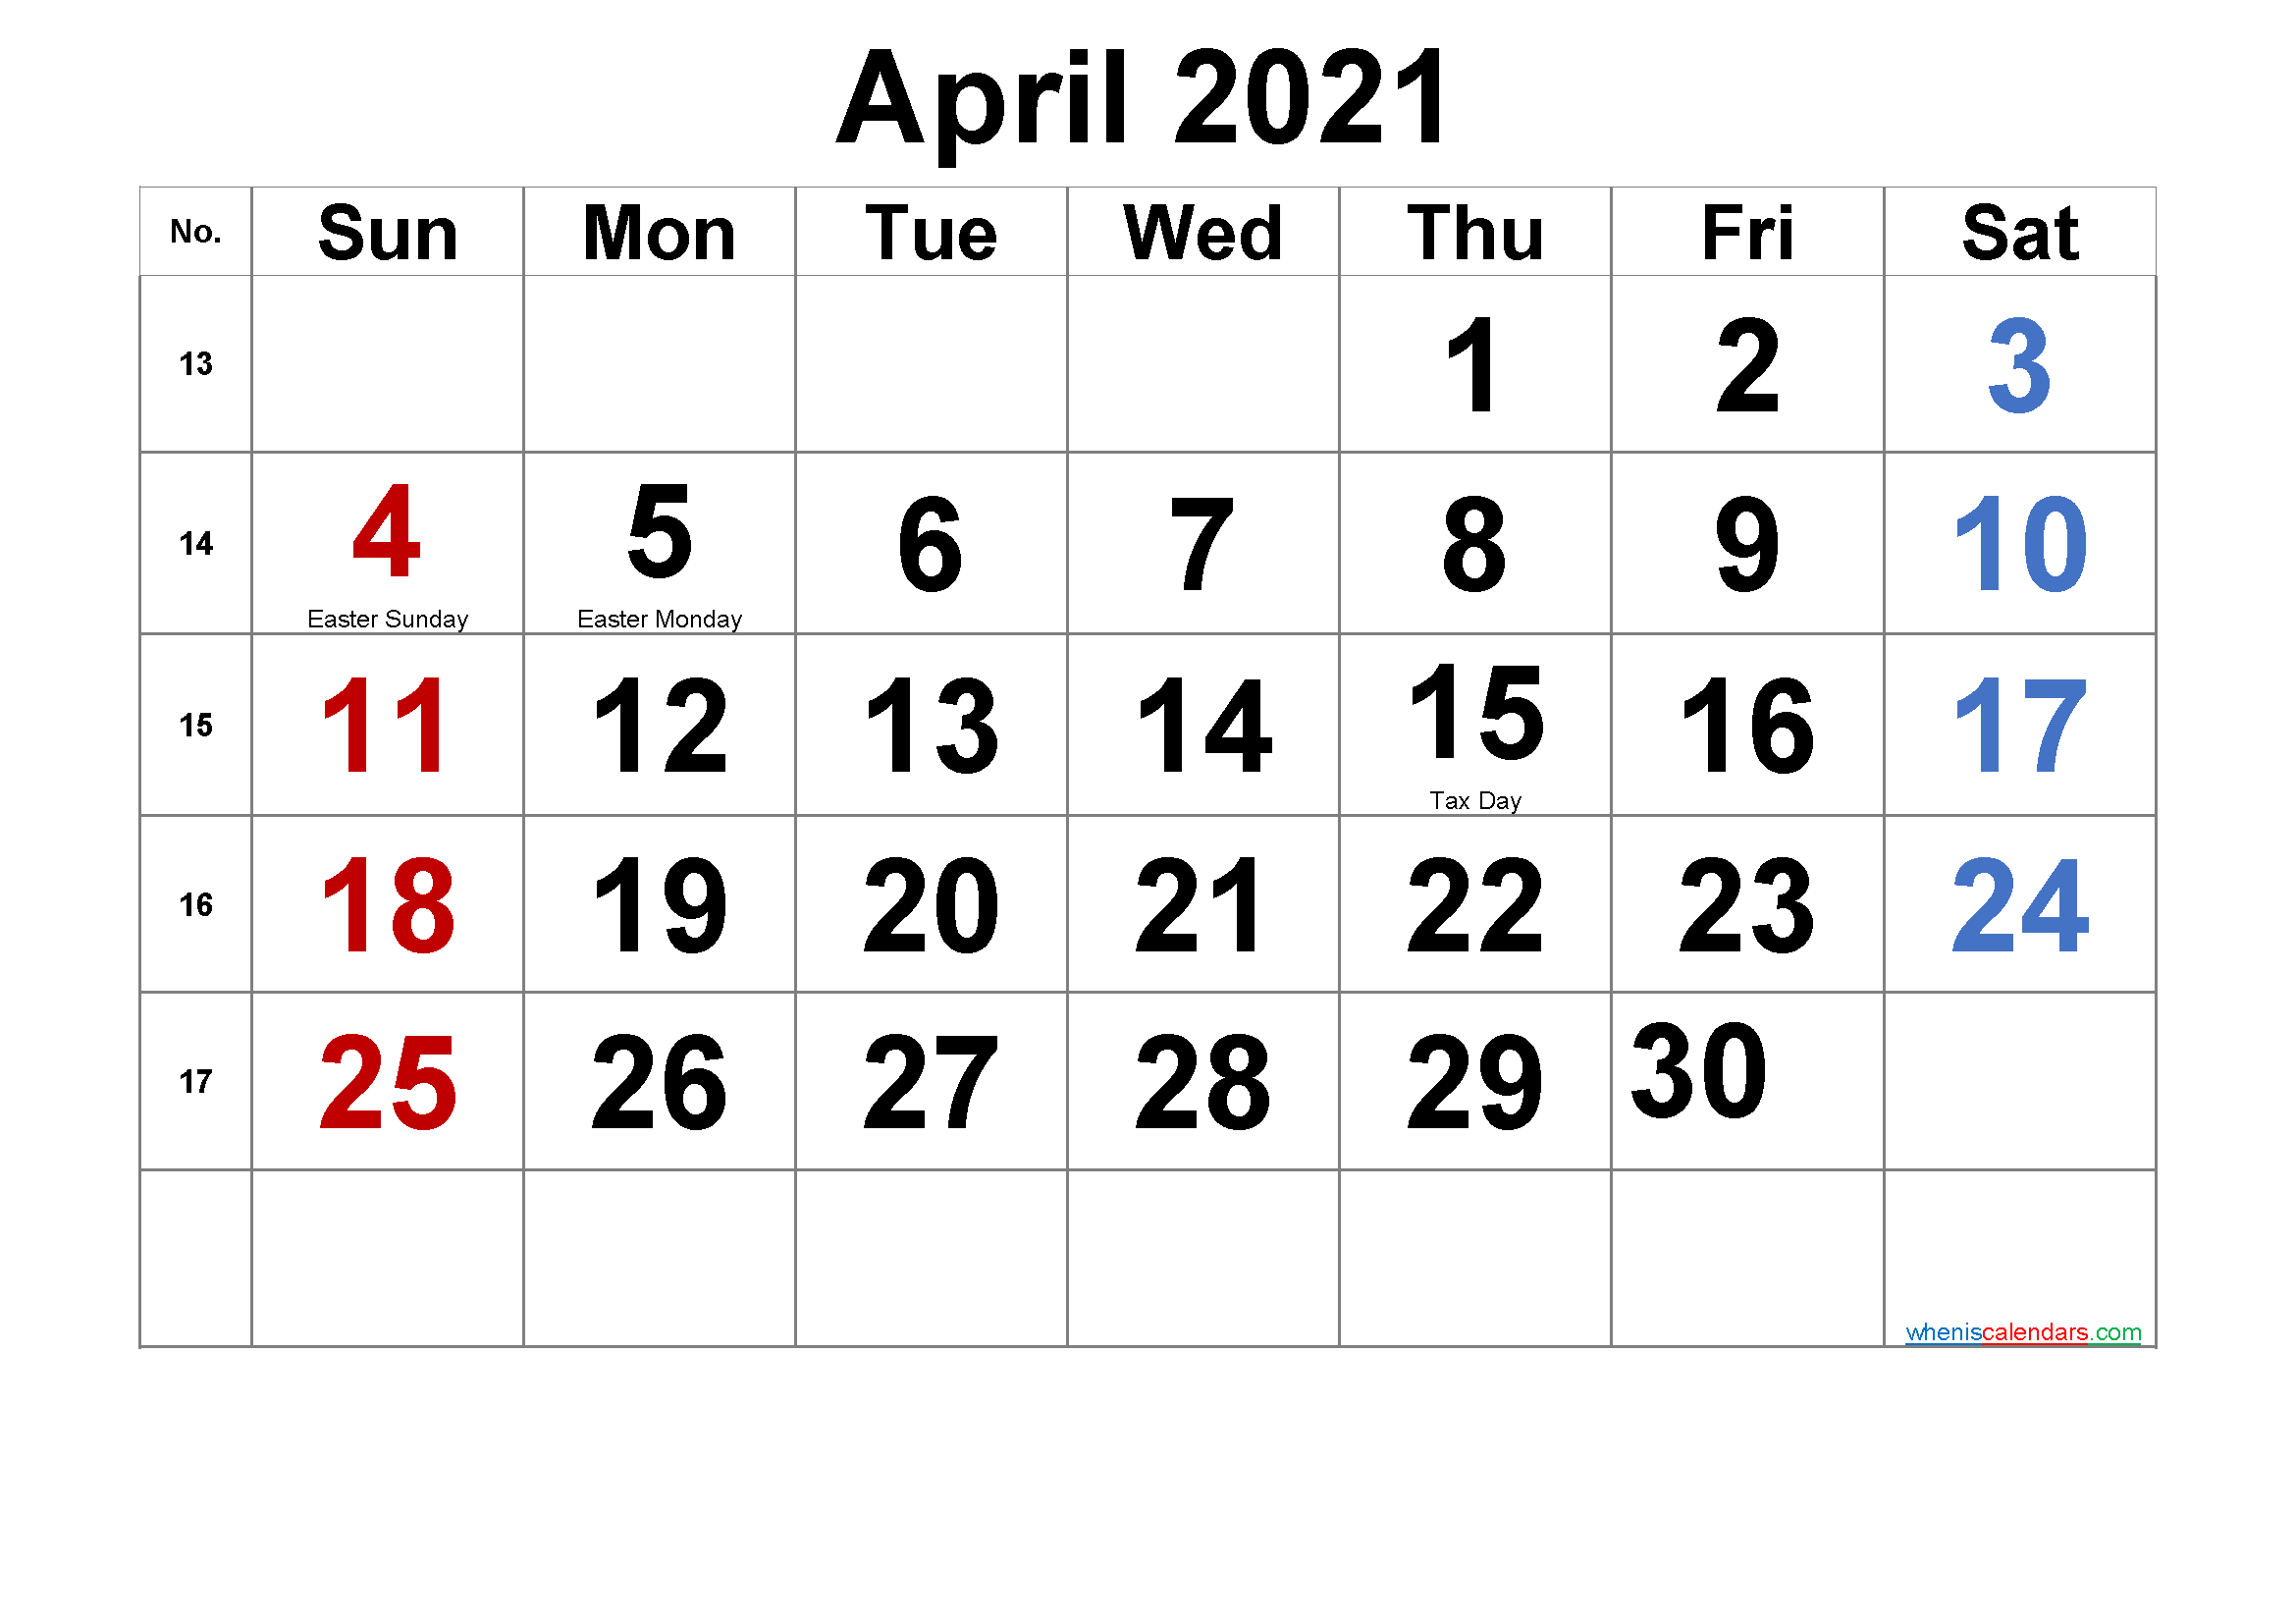 Free Printable April 2021 Calendar With Holidays - Free